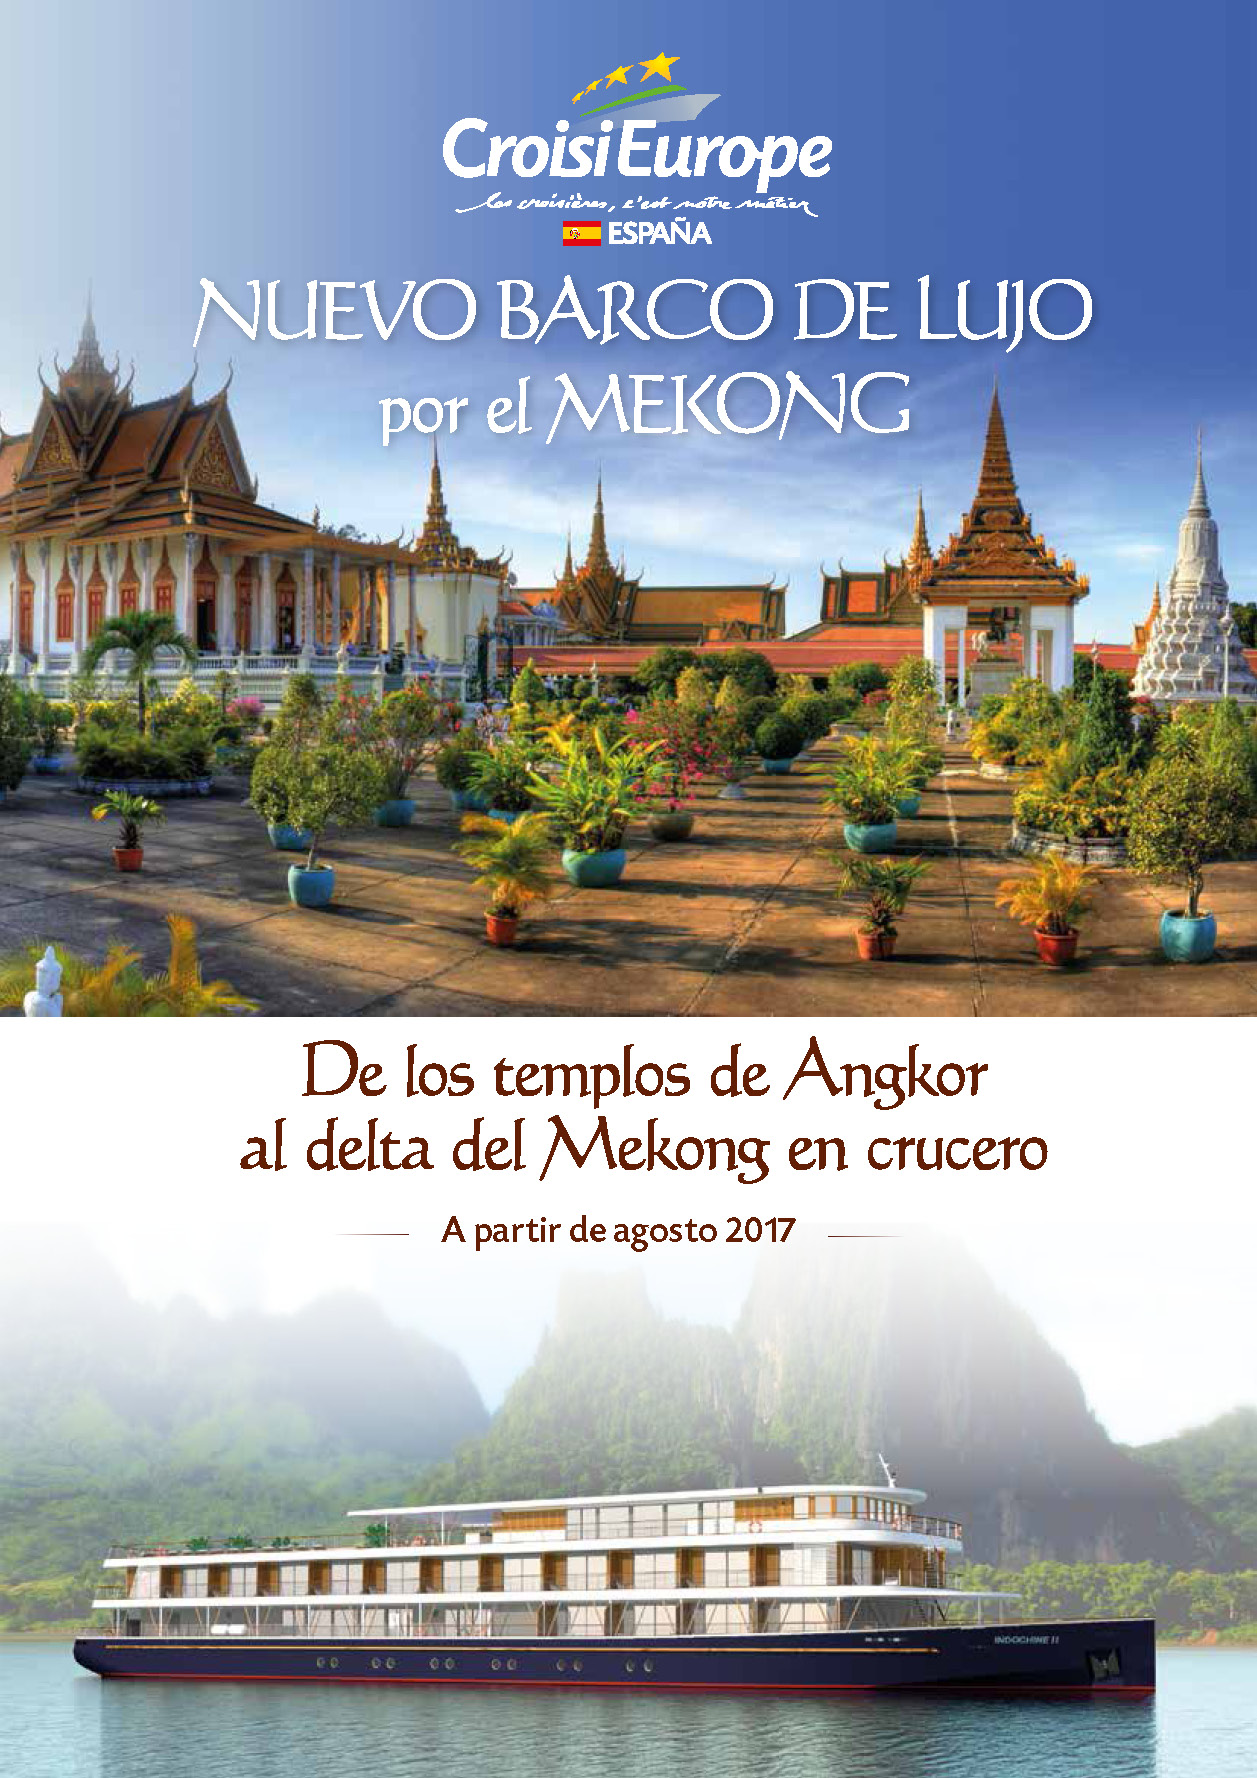 Catalogo CroisiEurope Mekong 2017